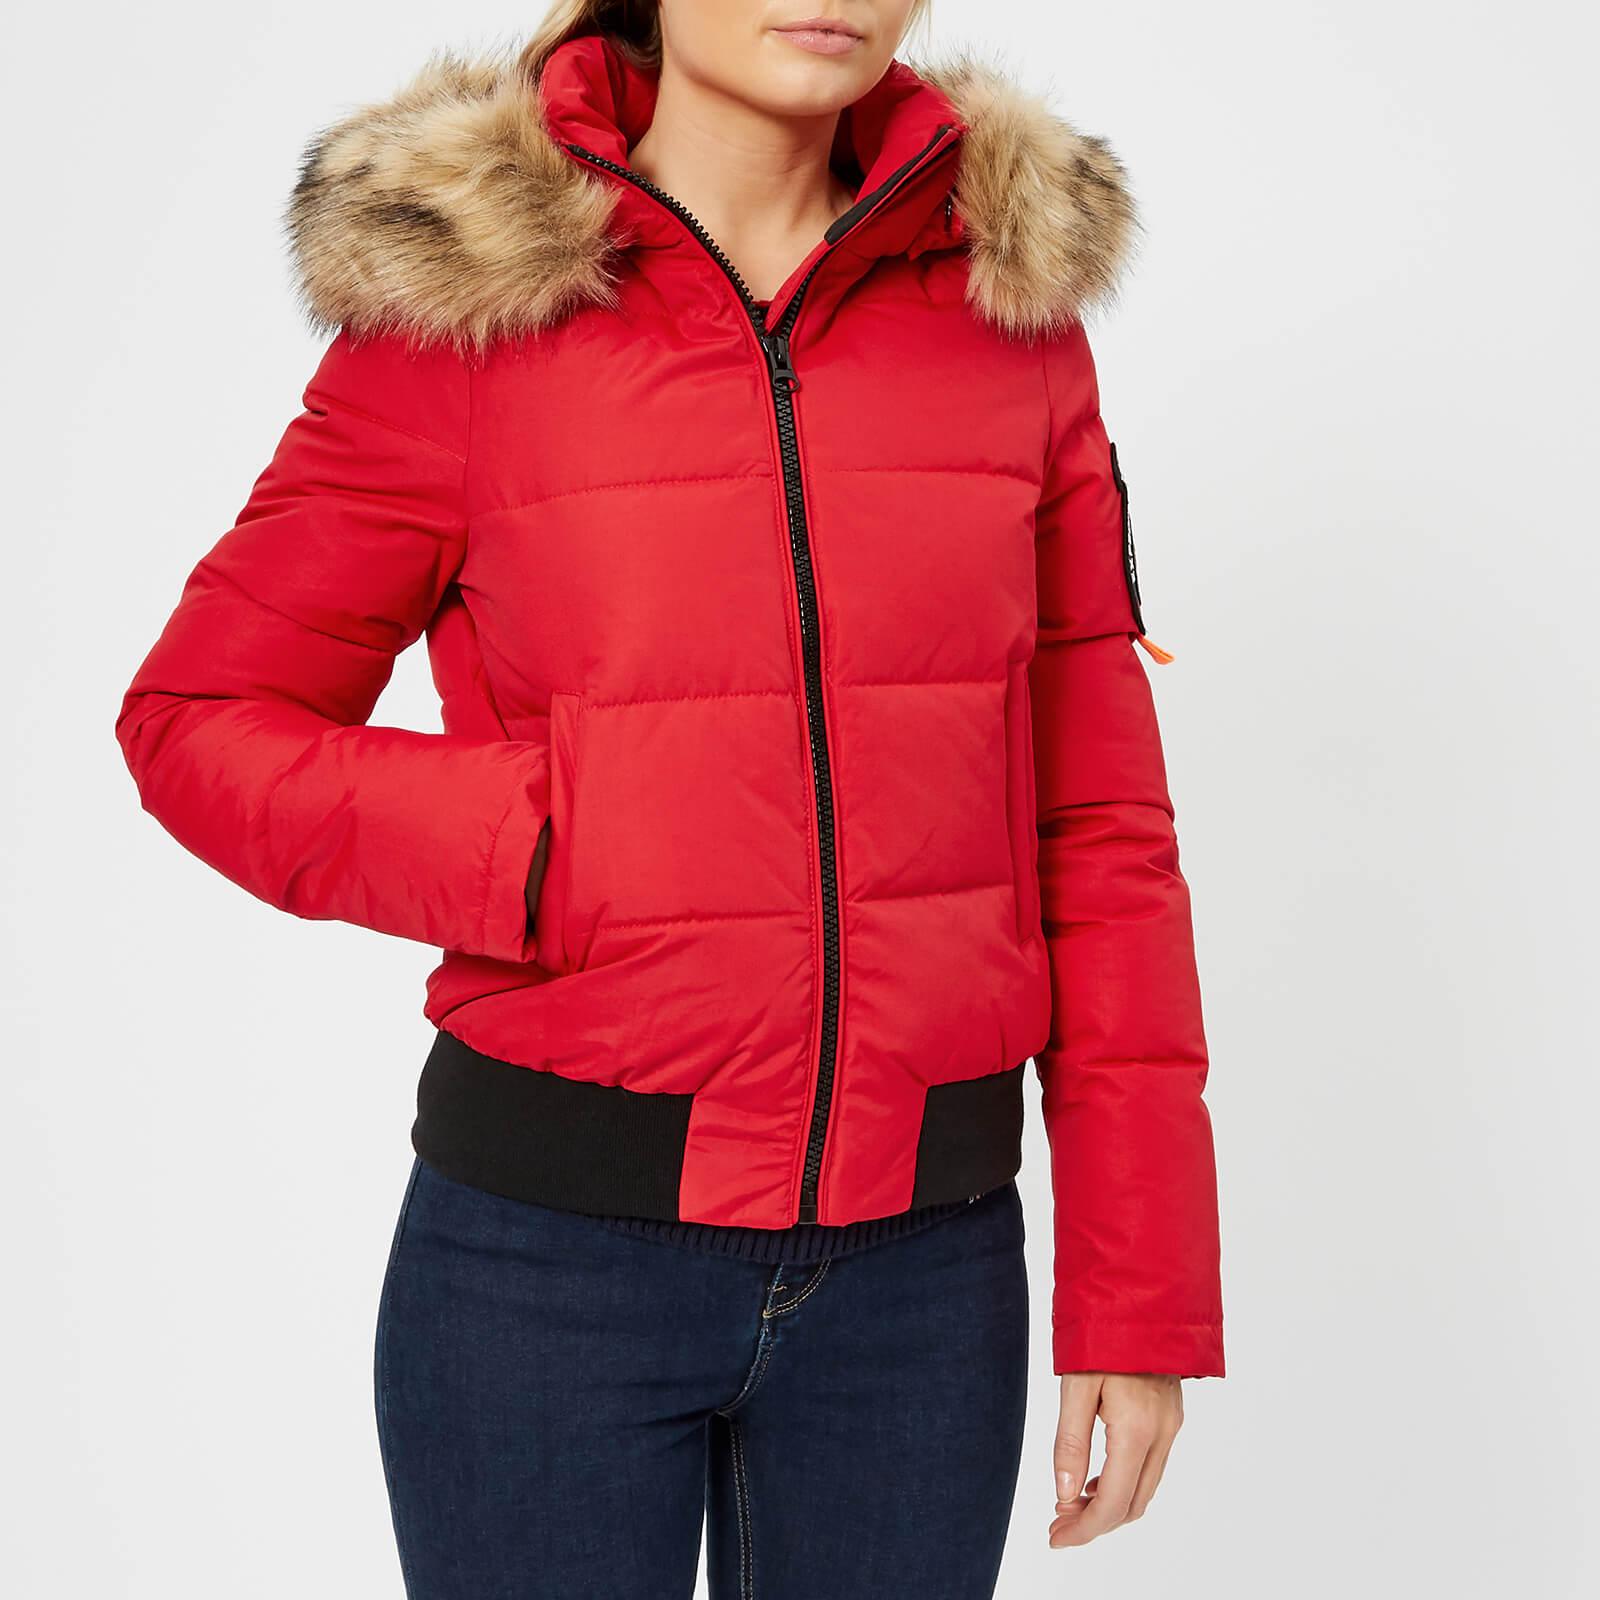 96ac03ad5 Superdry Women's Everest Ella Bomber Jacket - Red